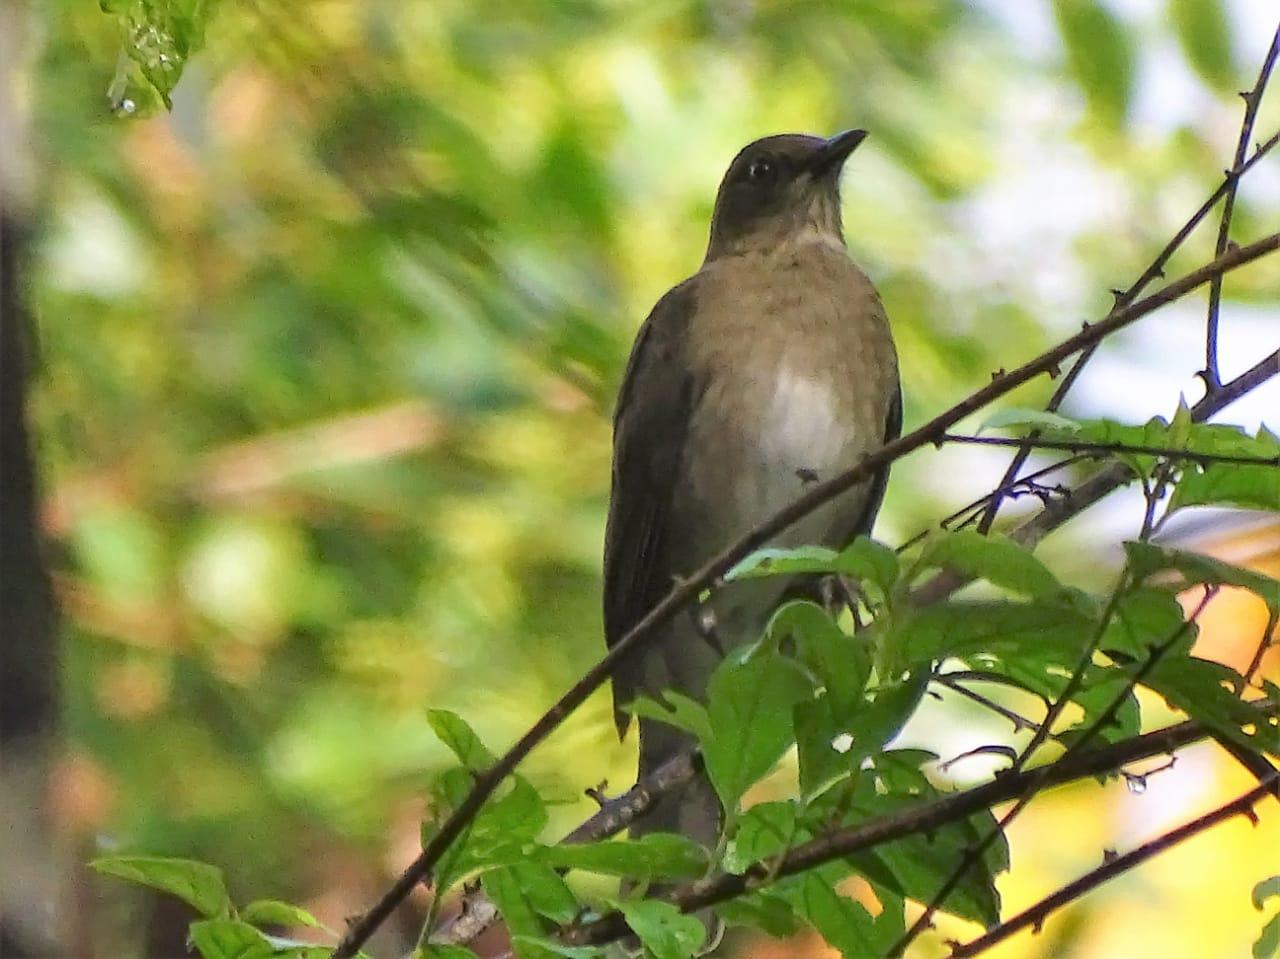 Avistamiento aves Amazonas (16)